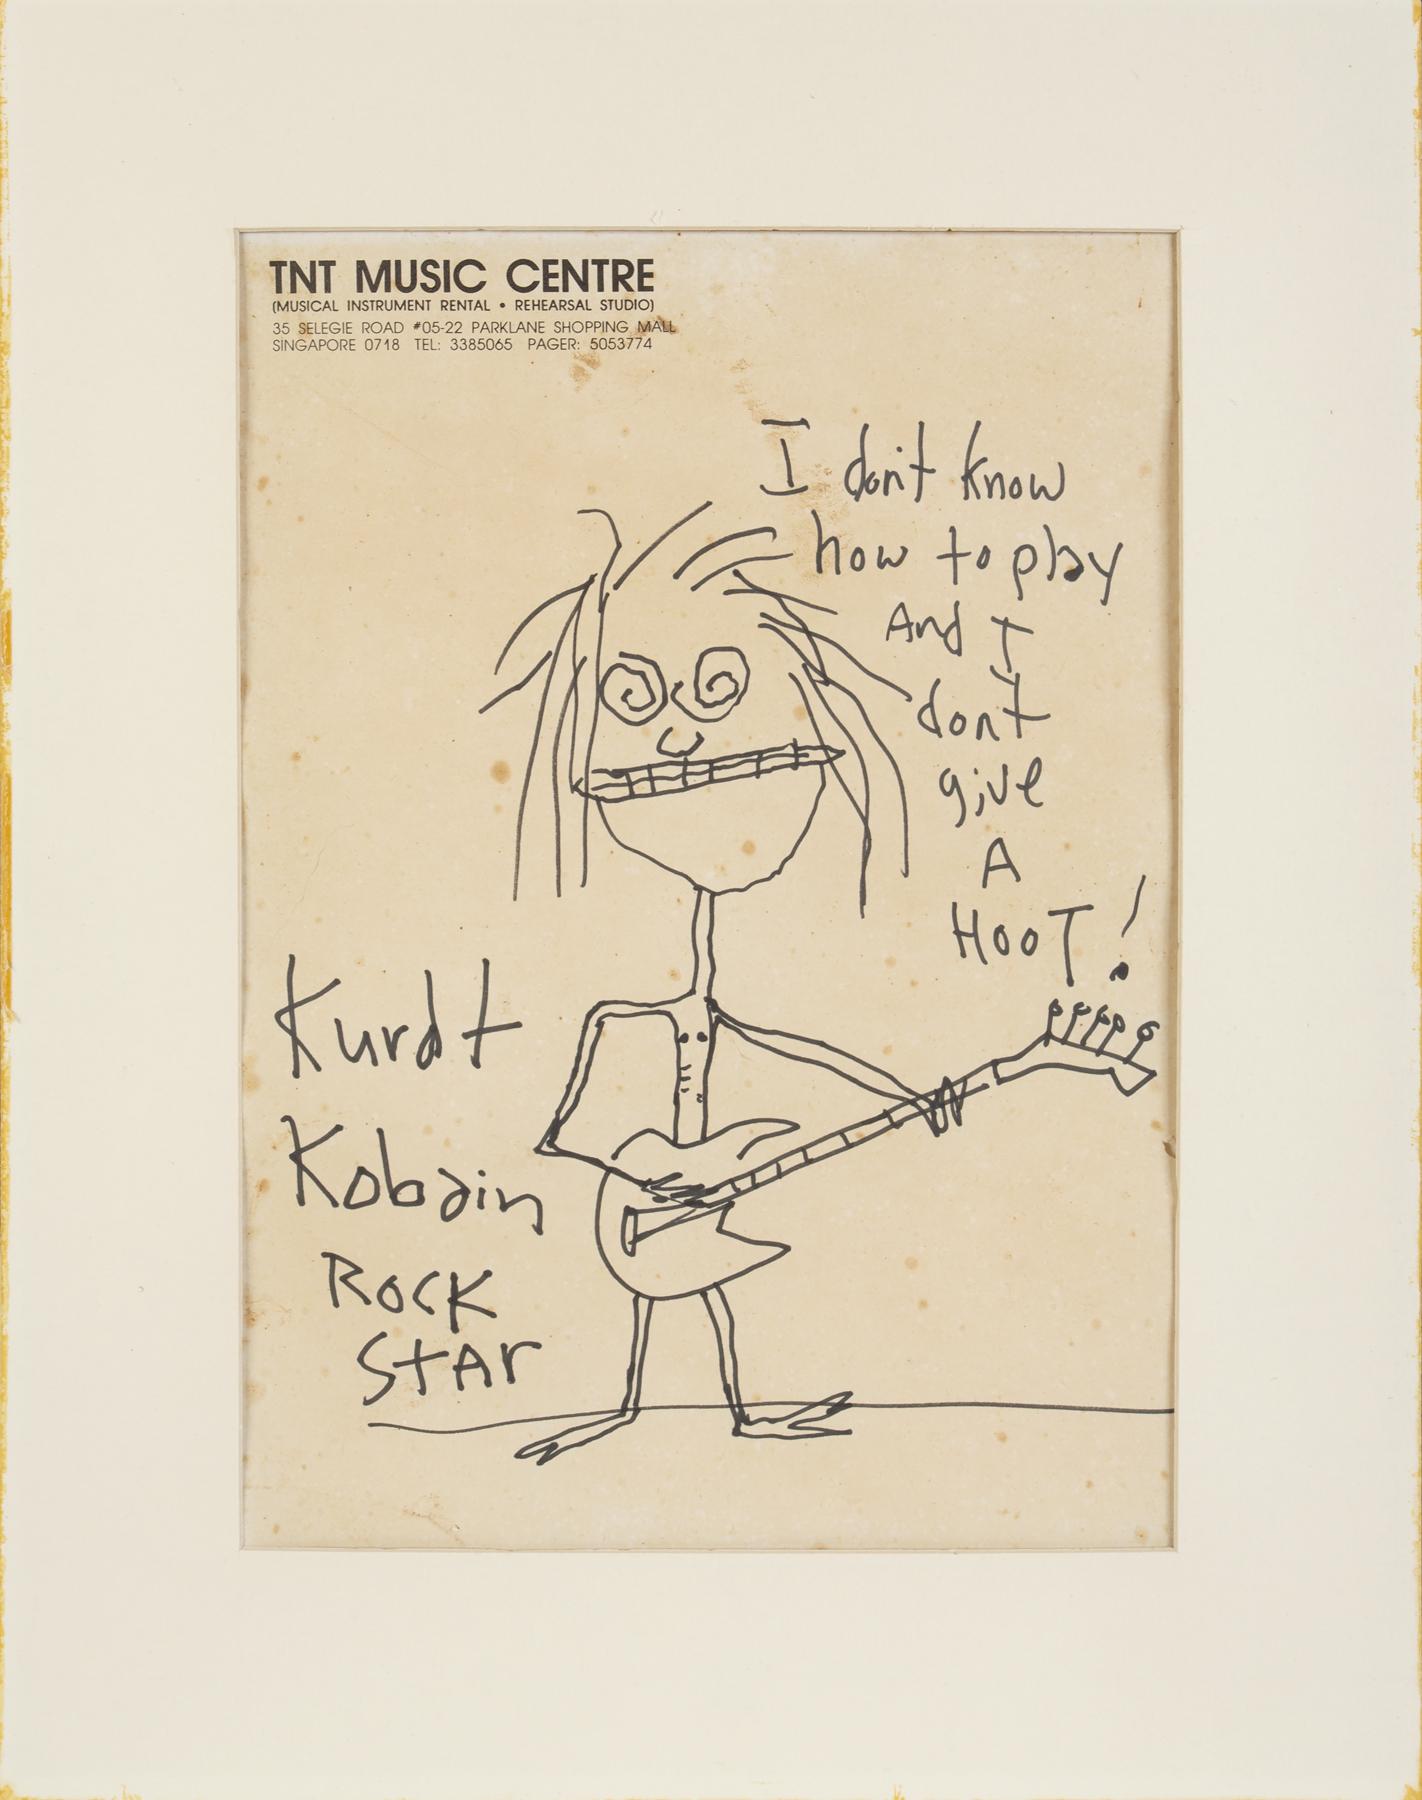 Drawing by Kurt Cobain